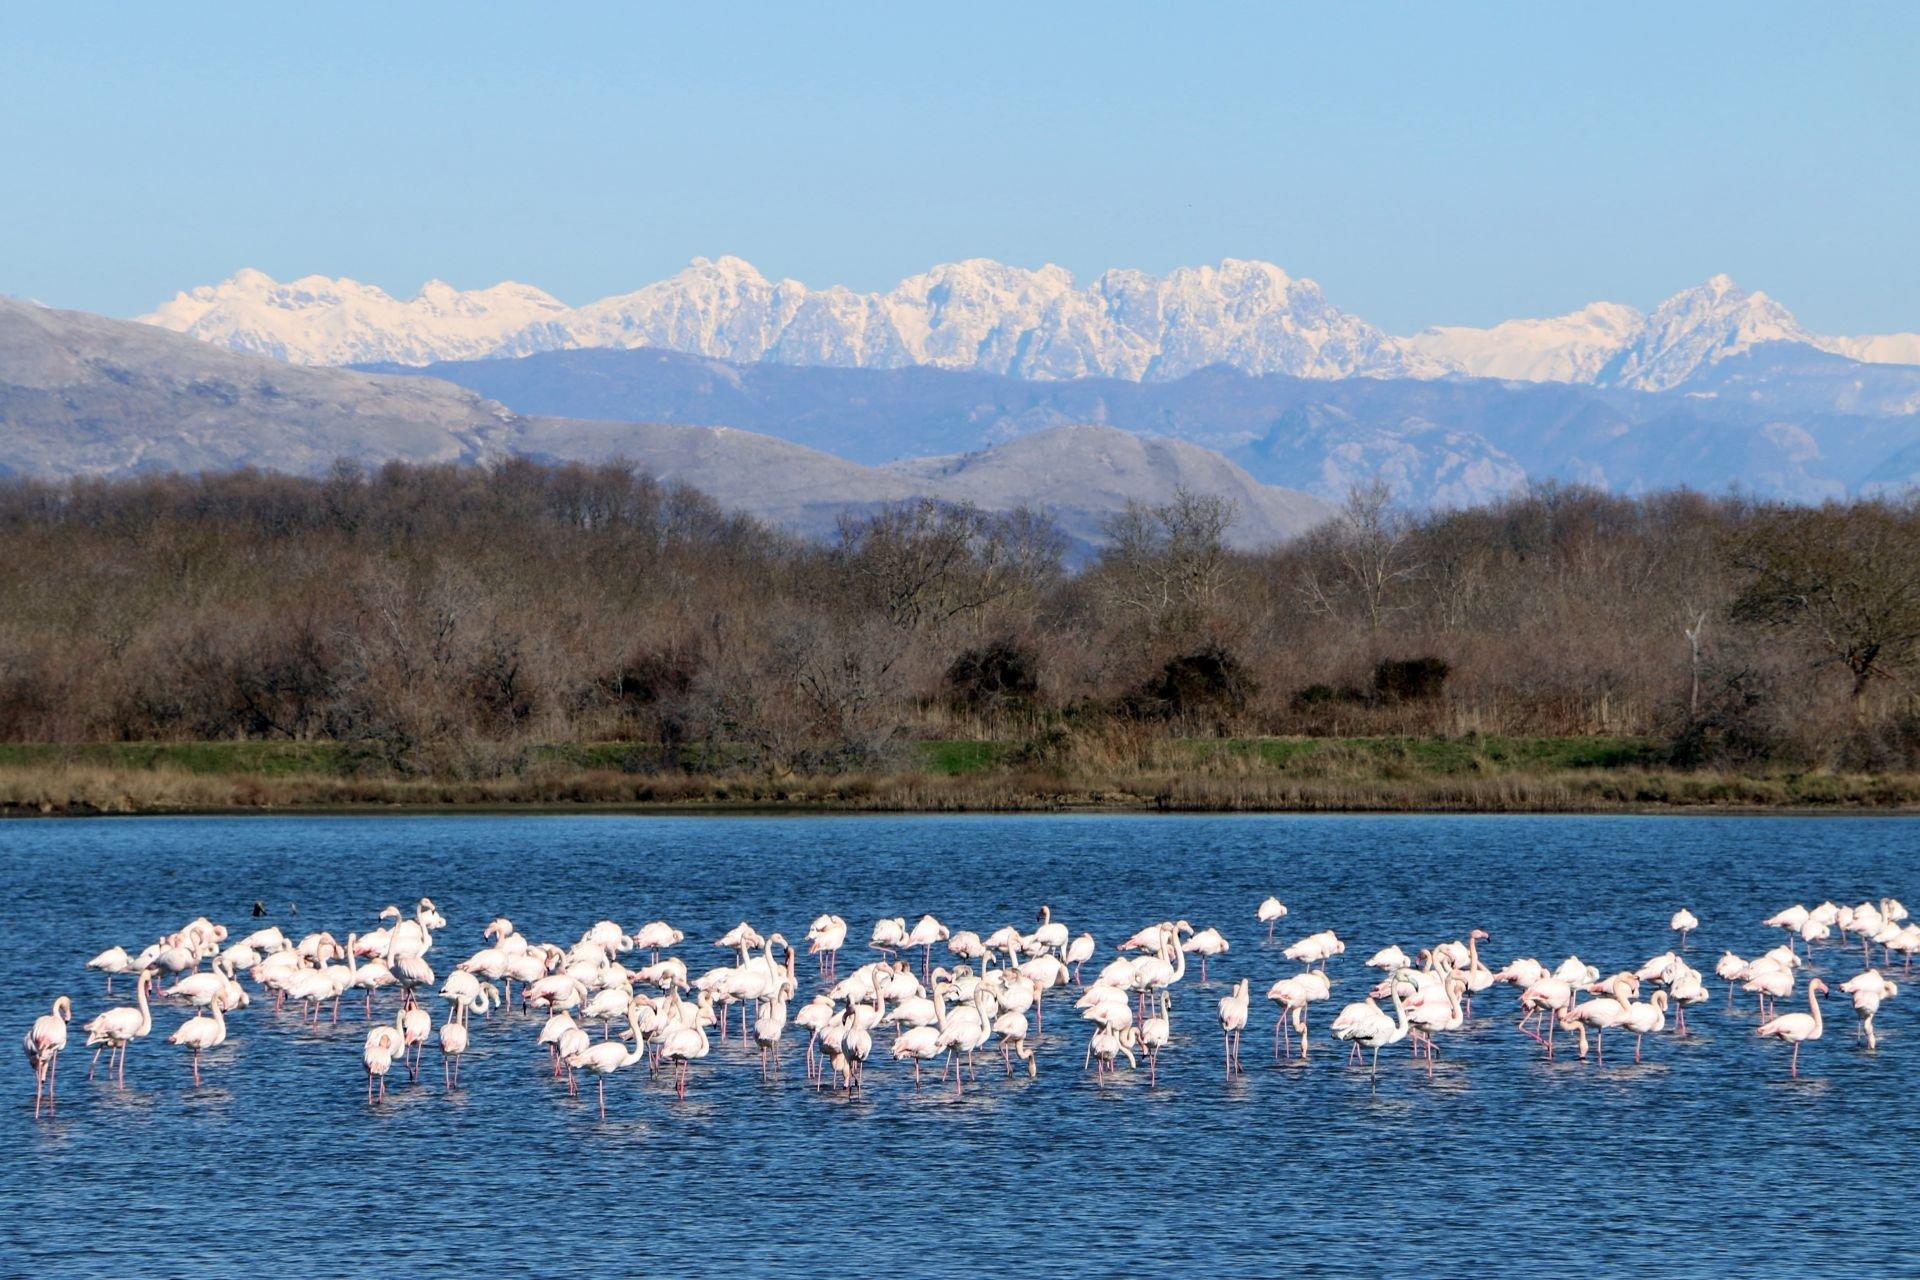 Flamingoes in Ulcinj in Montenegro - Best Season 2019